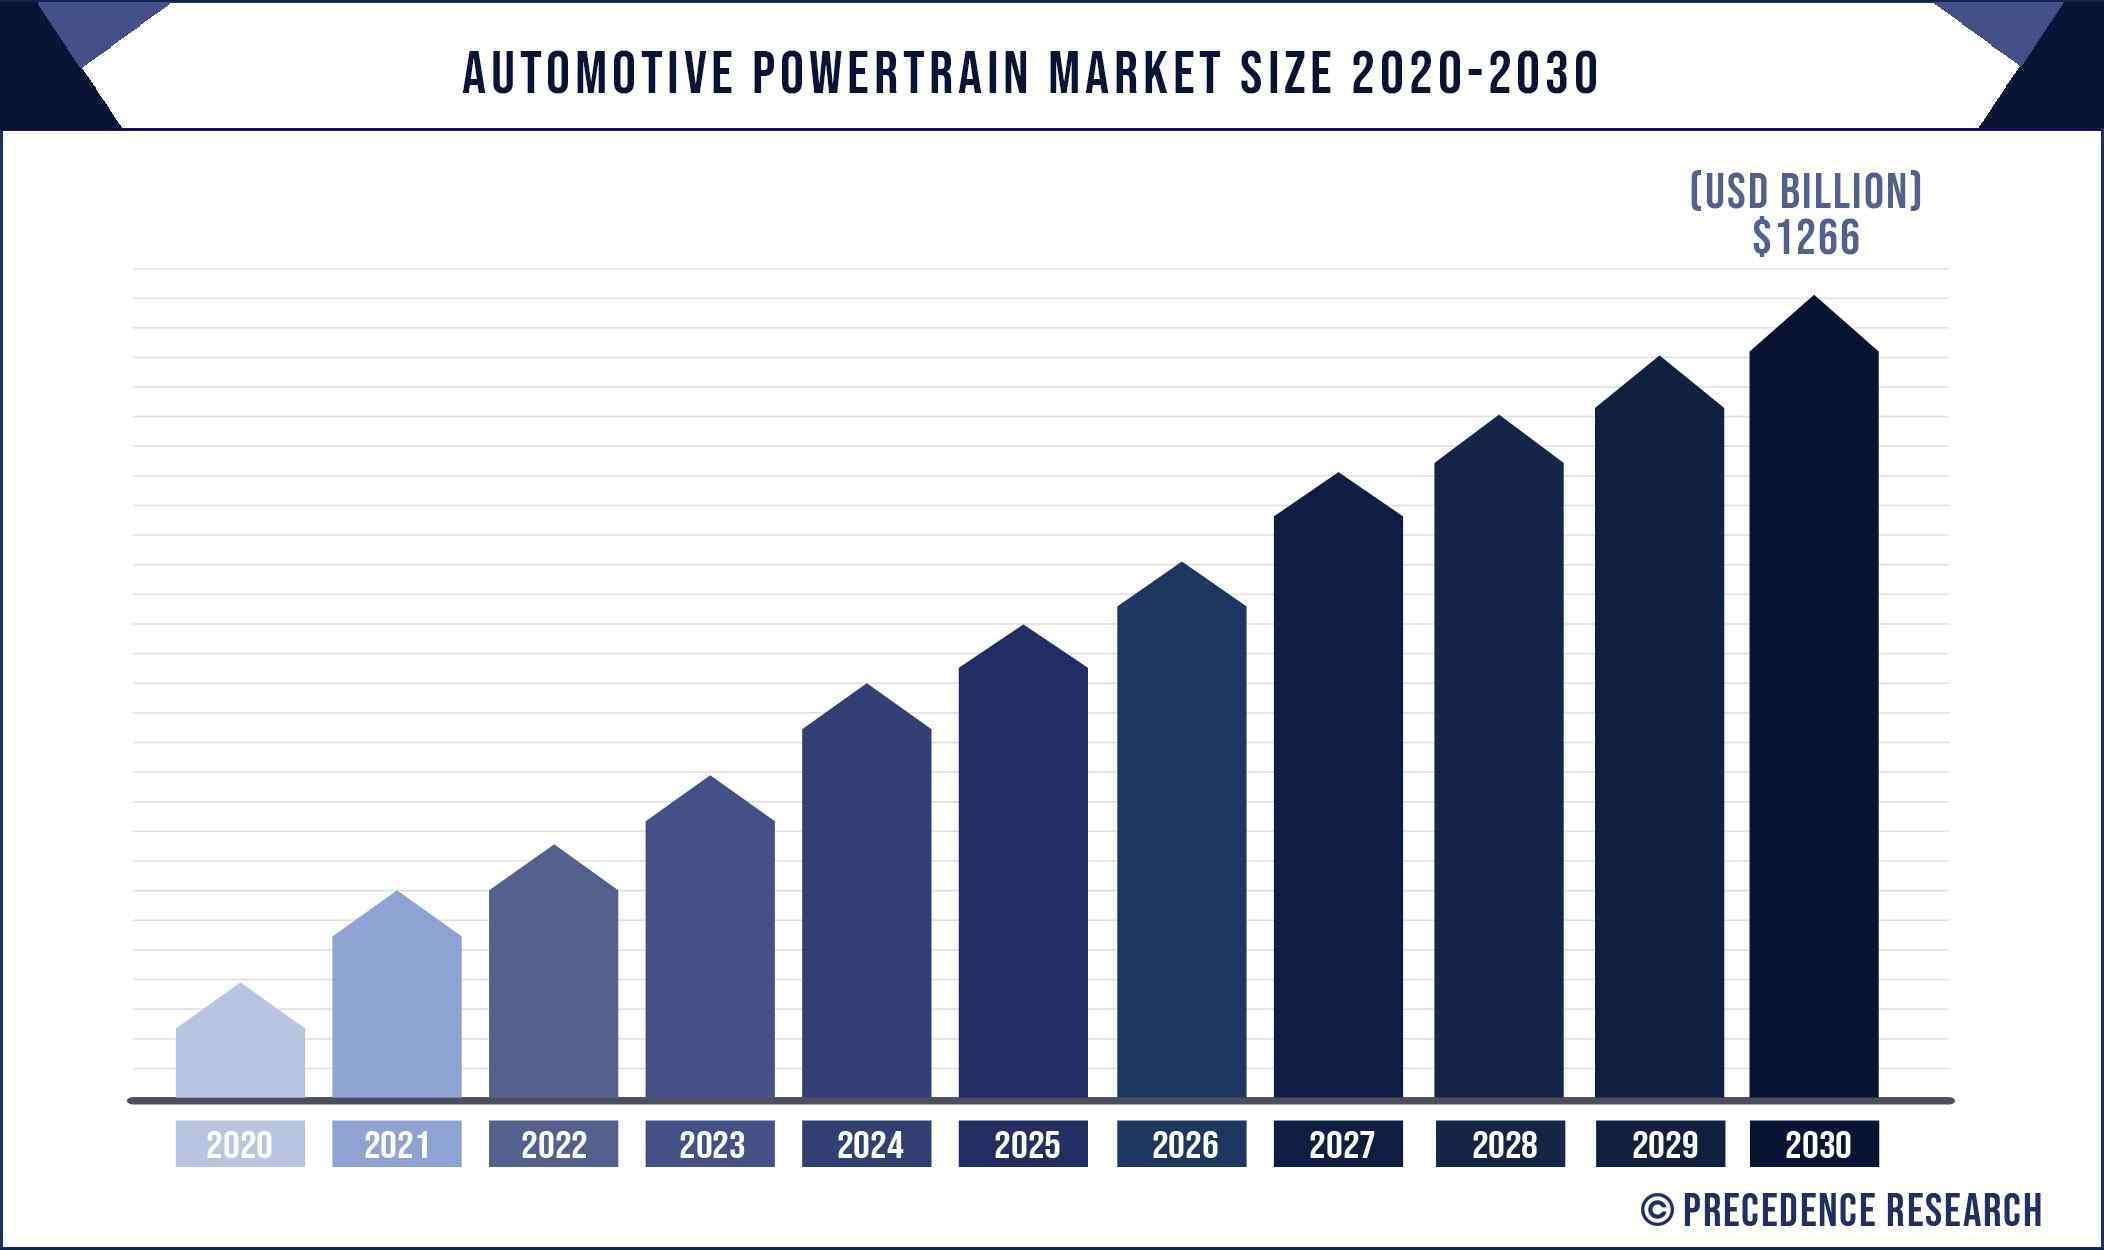 Automotive Powertrain Market Size 2020 to 2030